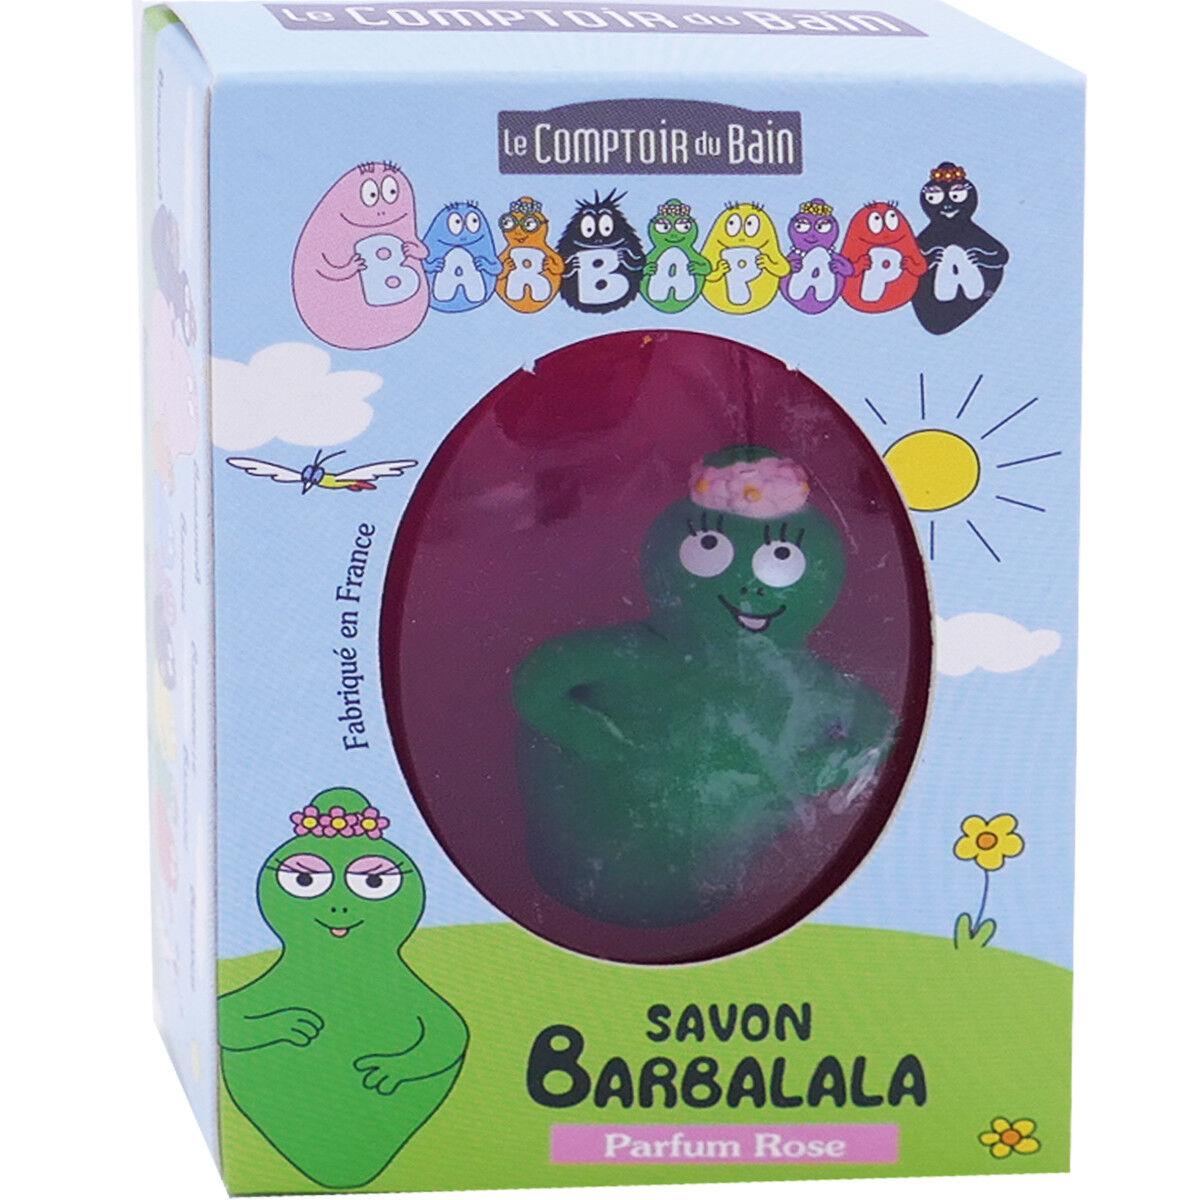 LE COMPTOIR DU BAIN Barbapapa savon barbalala parfum rose 84g + figurine